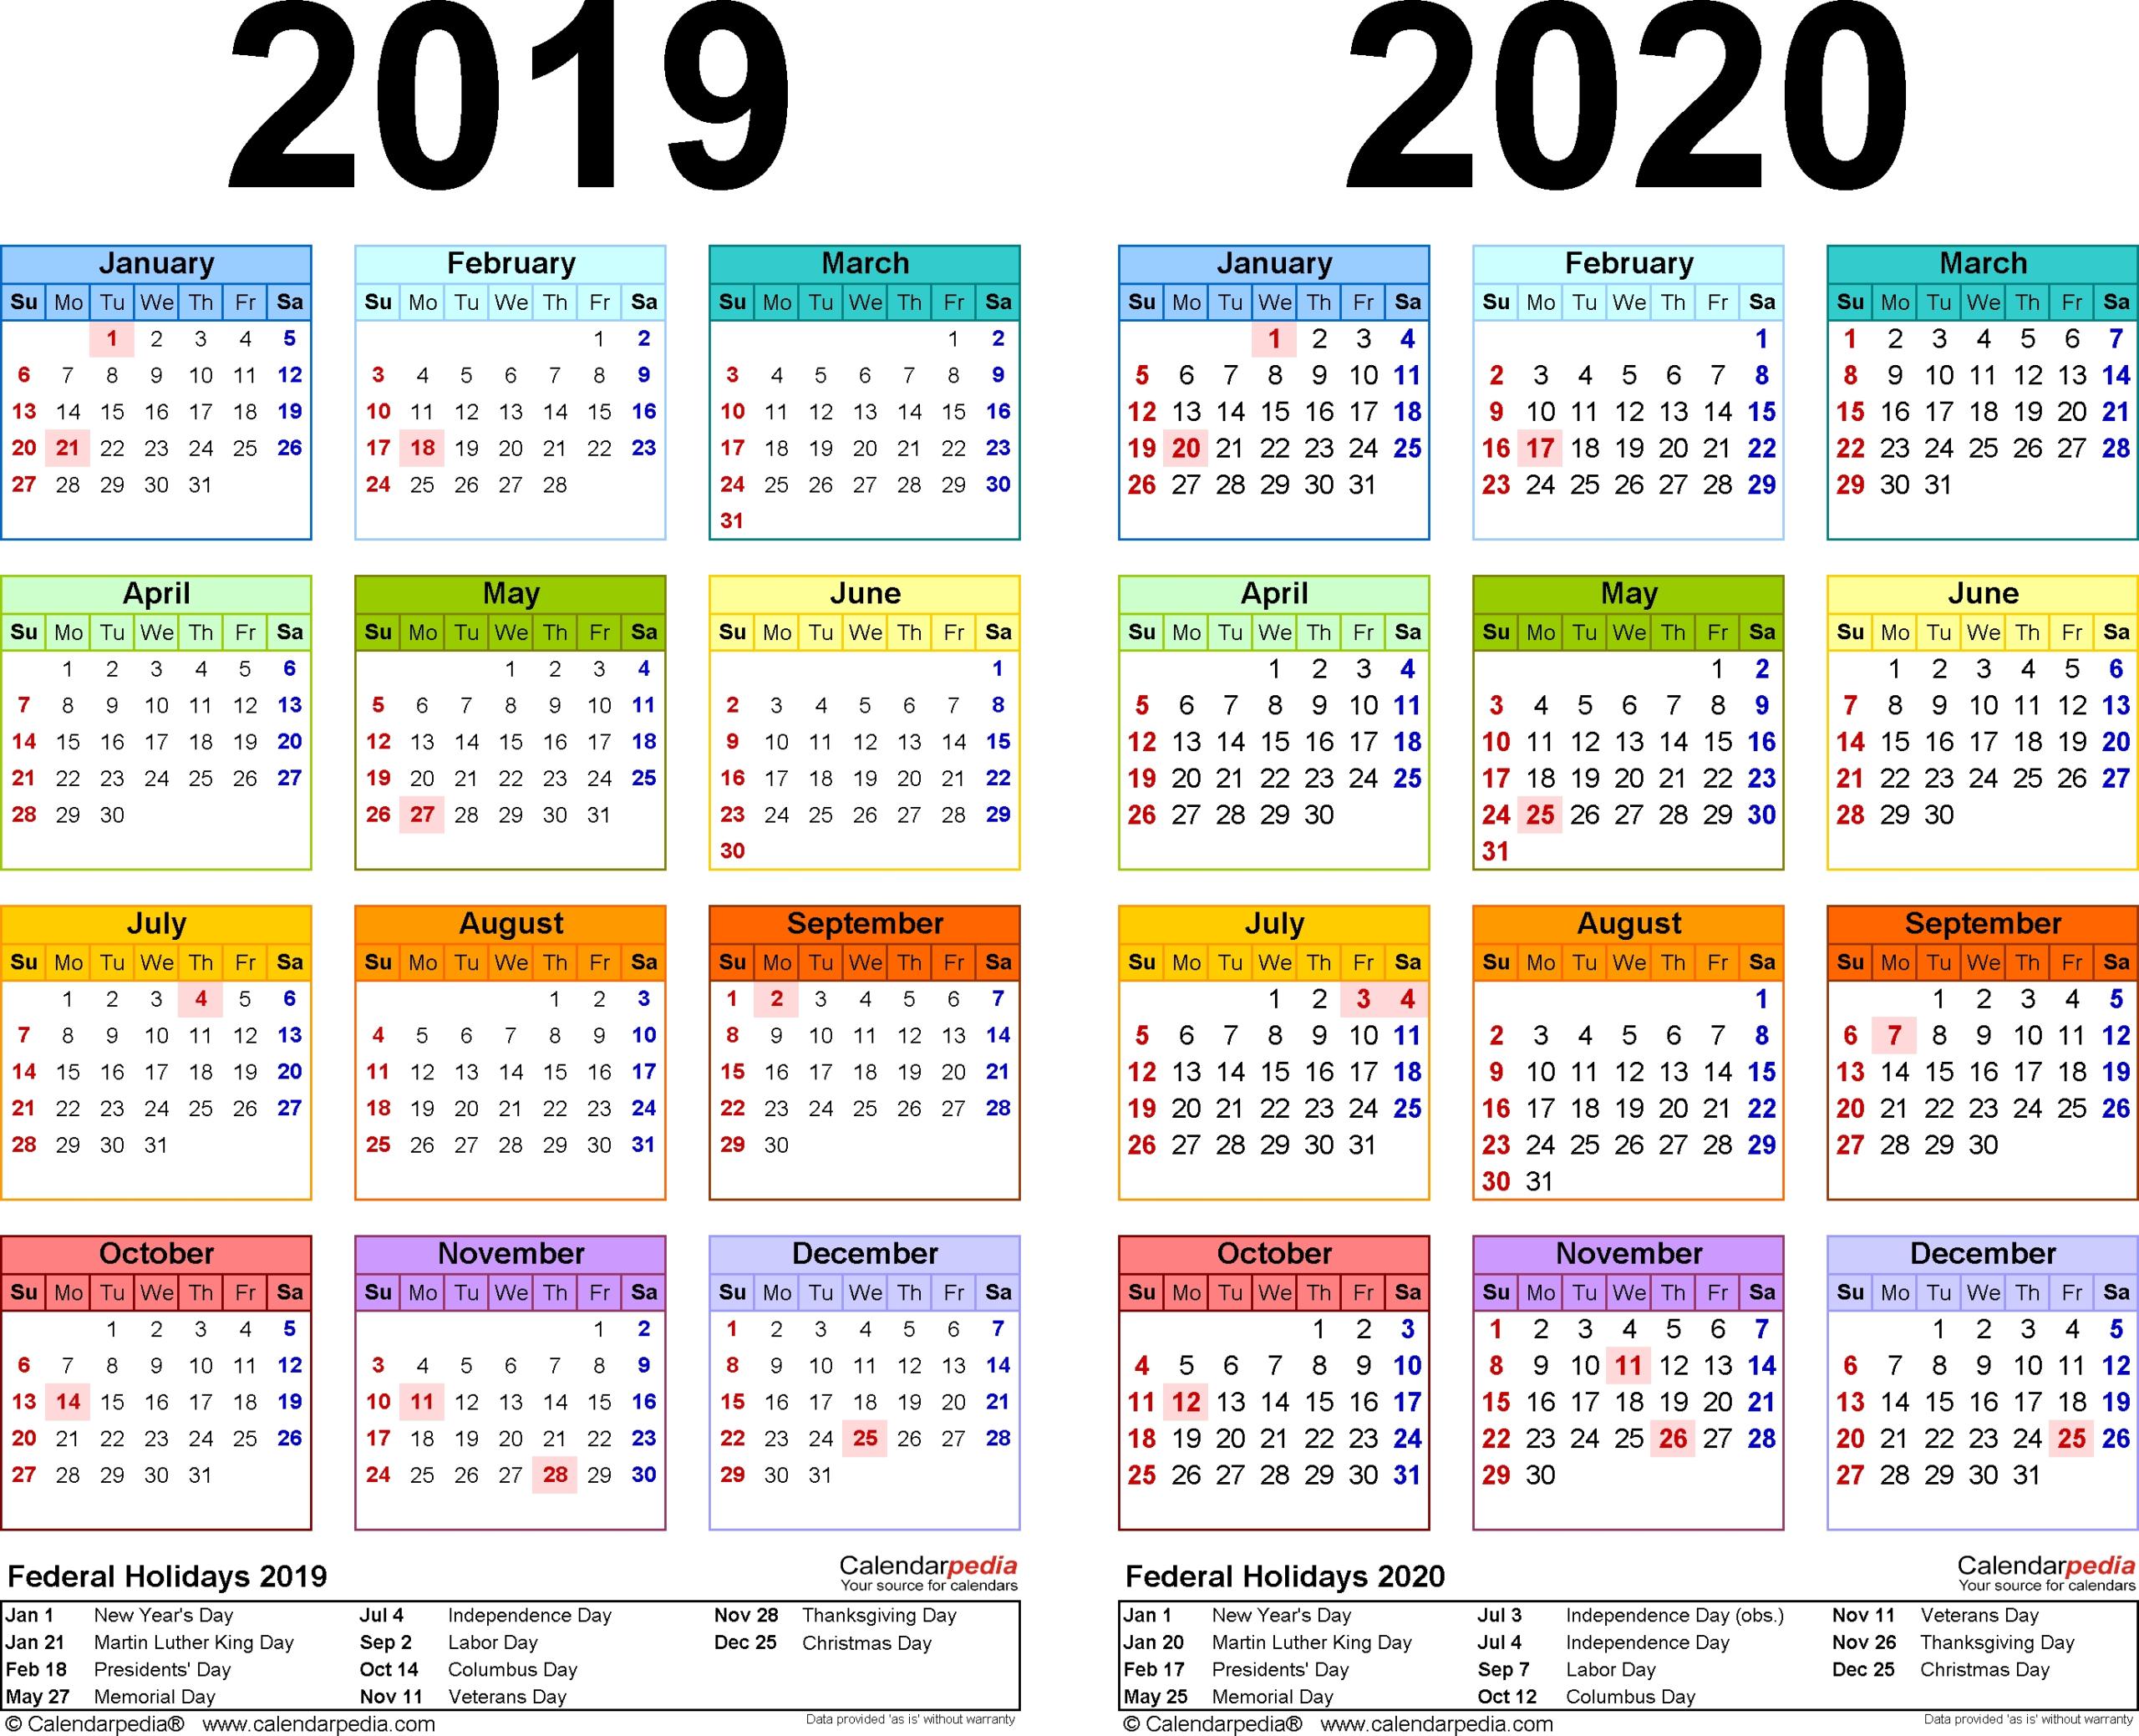 Free Printable Pocket Size Calendars - Calendar for Printable Pocket Calender